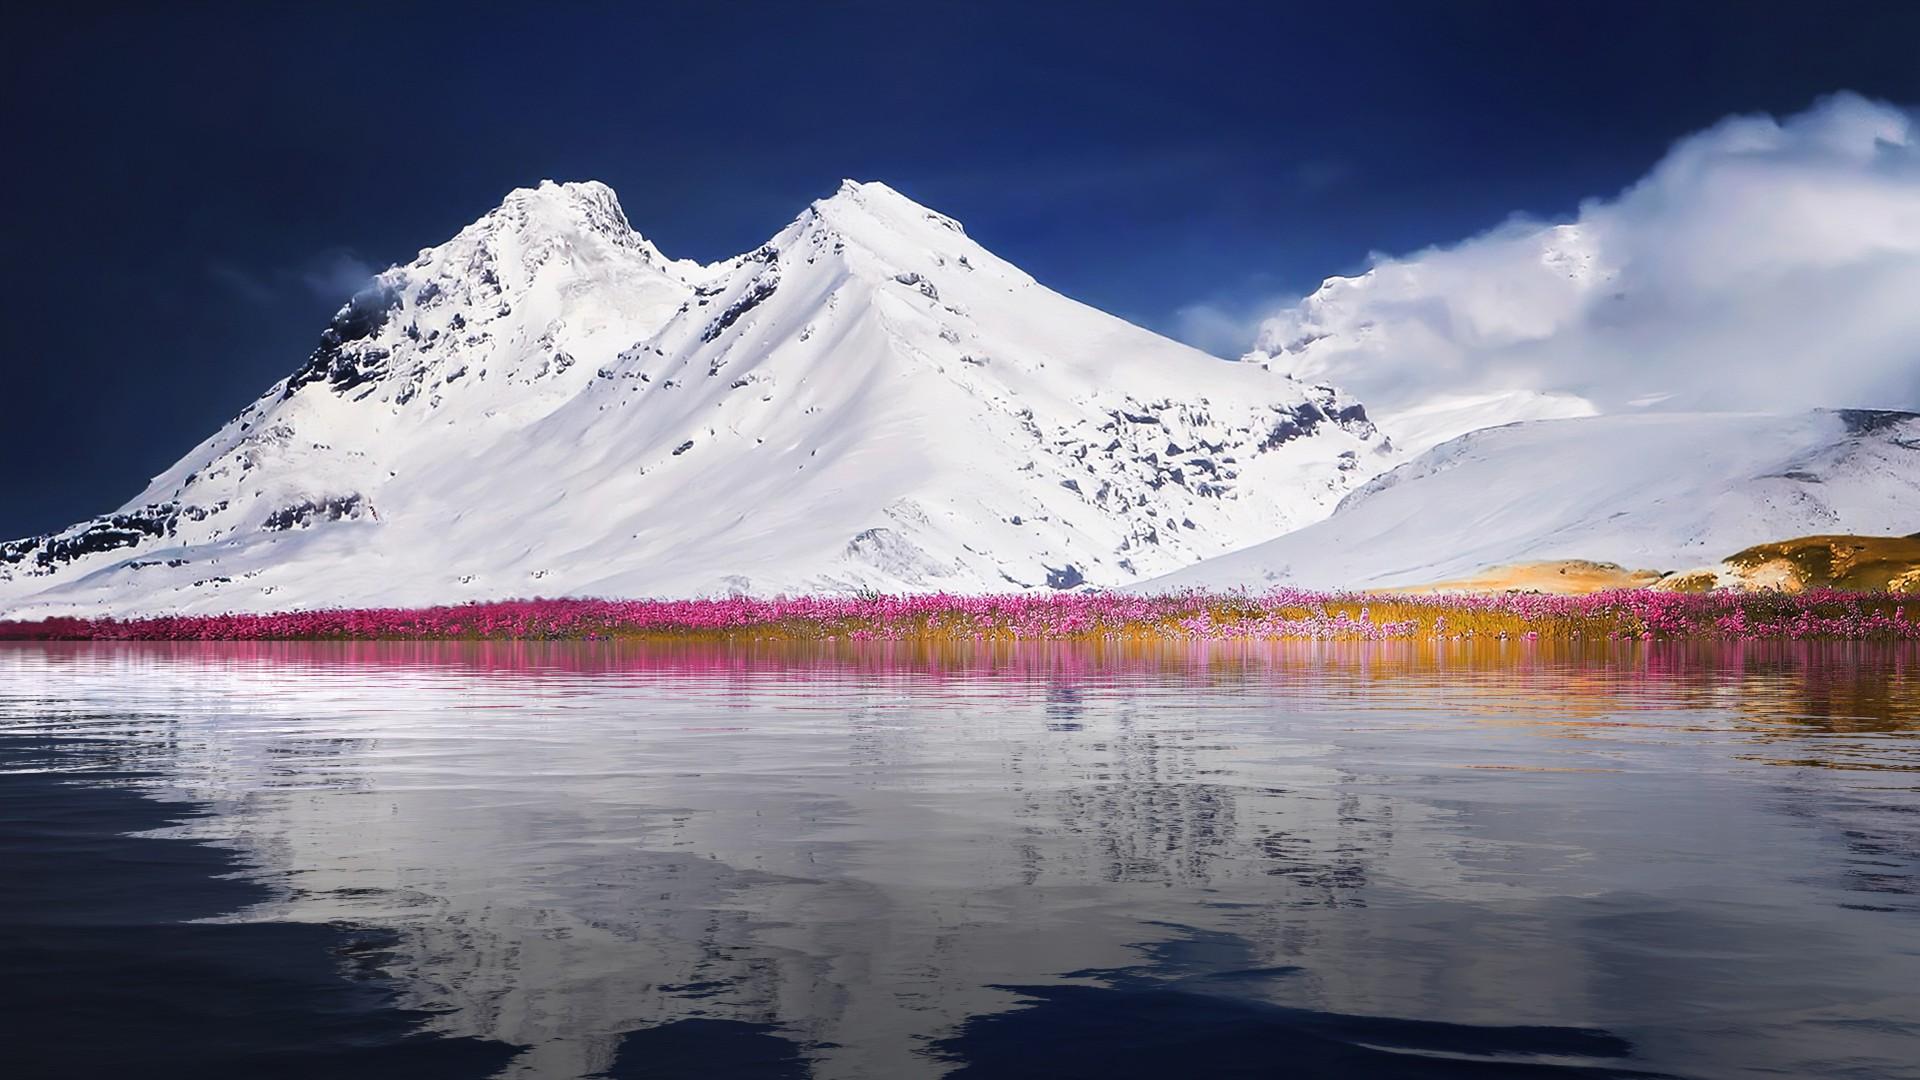 Iphone 6s Wallpaper Fall Winter Mountain Landscape 4k Wallpapers Hd Wallpapers